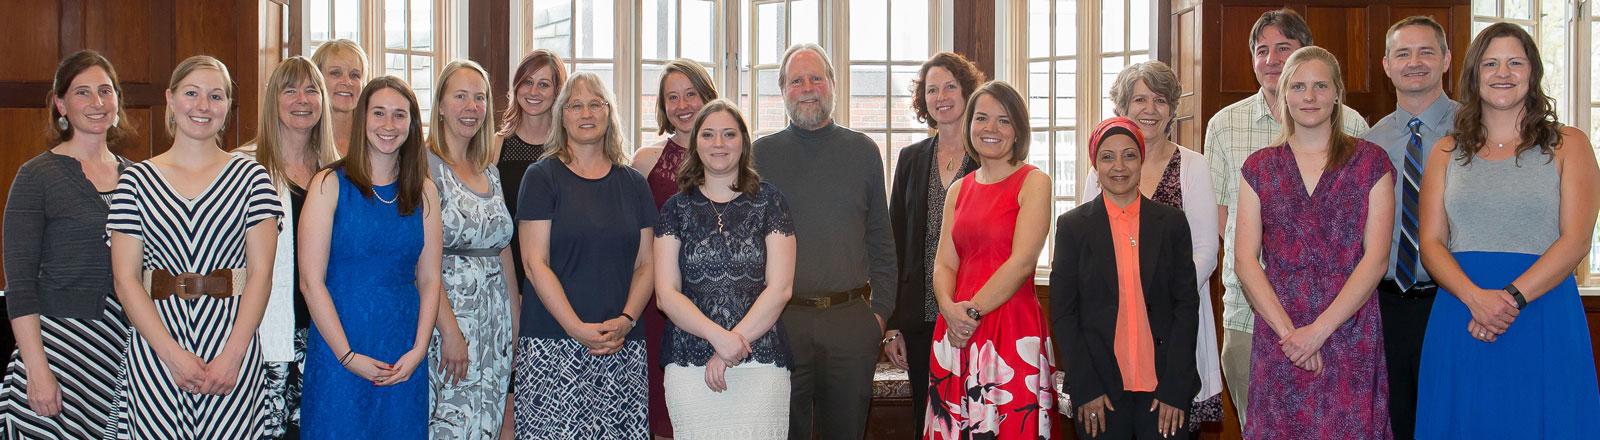 Dean's Citation Award Winners